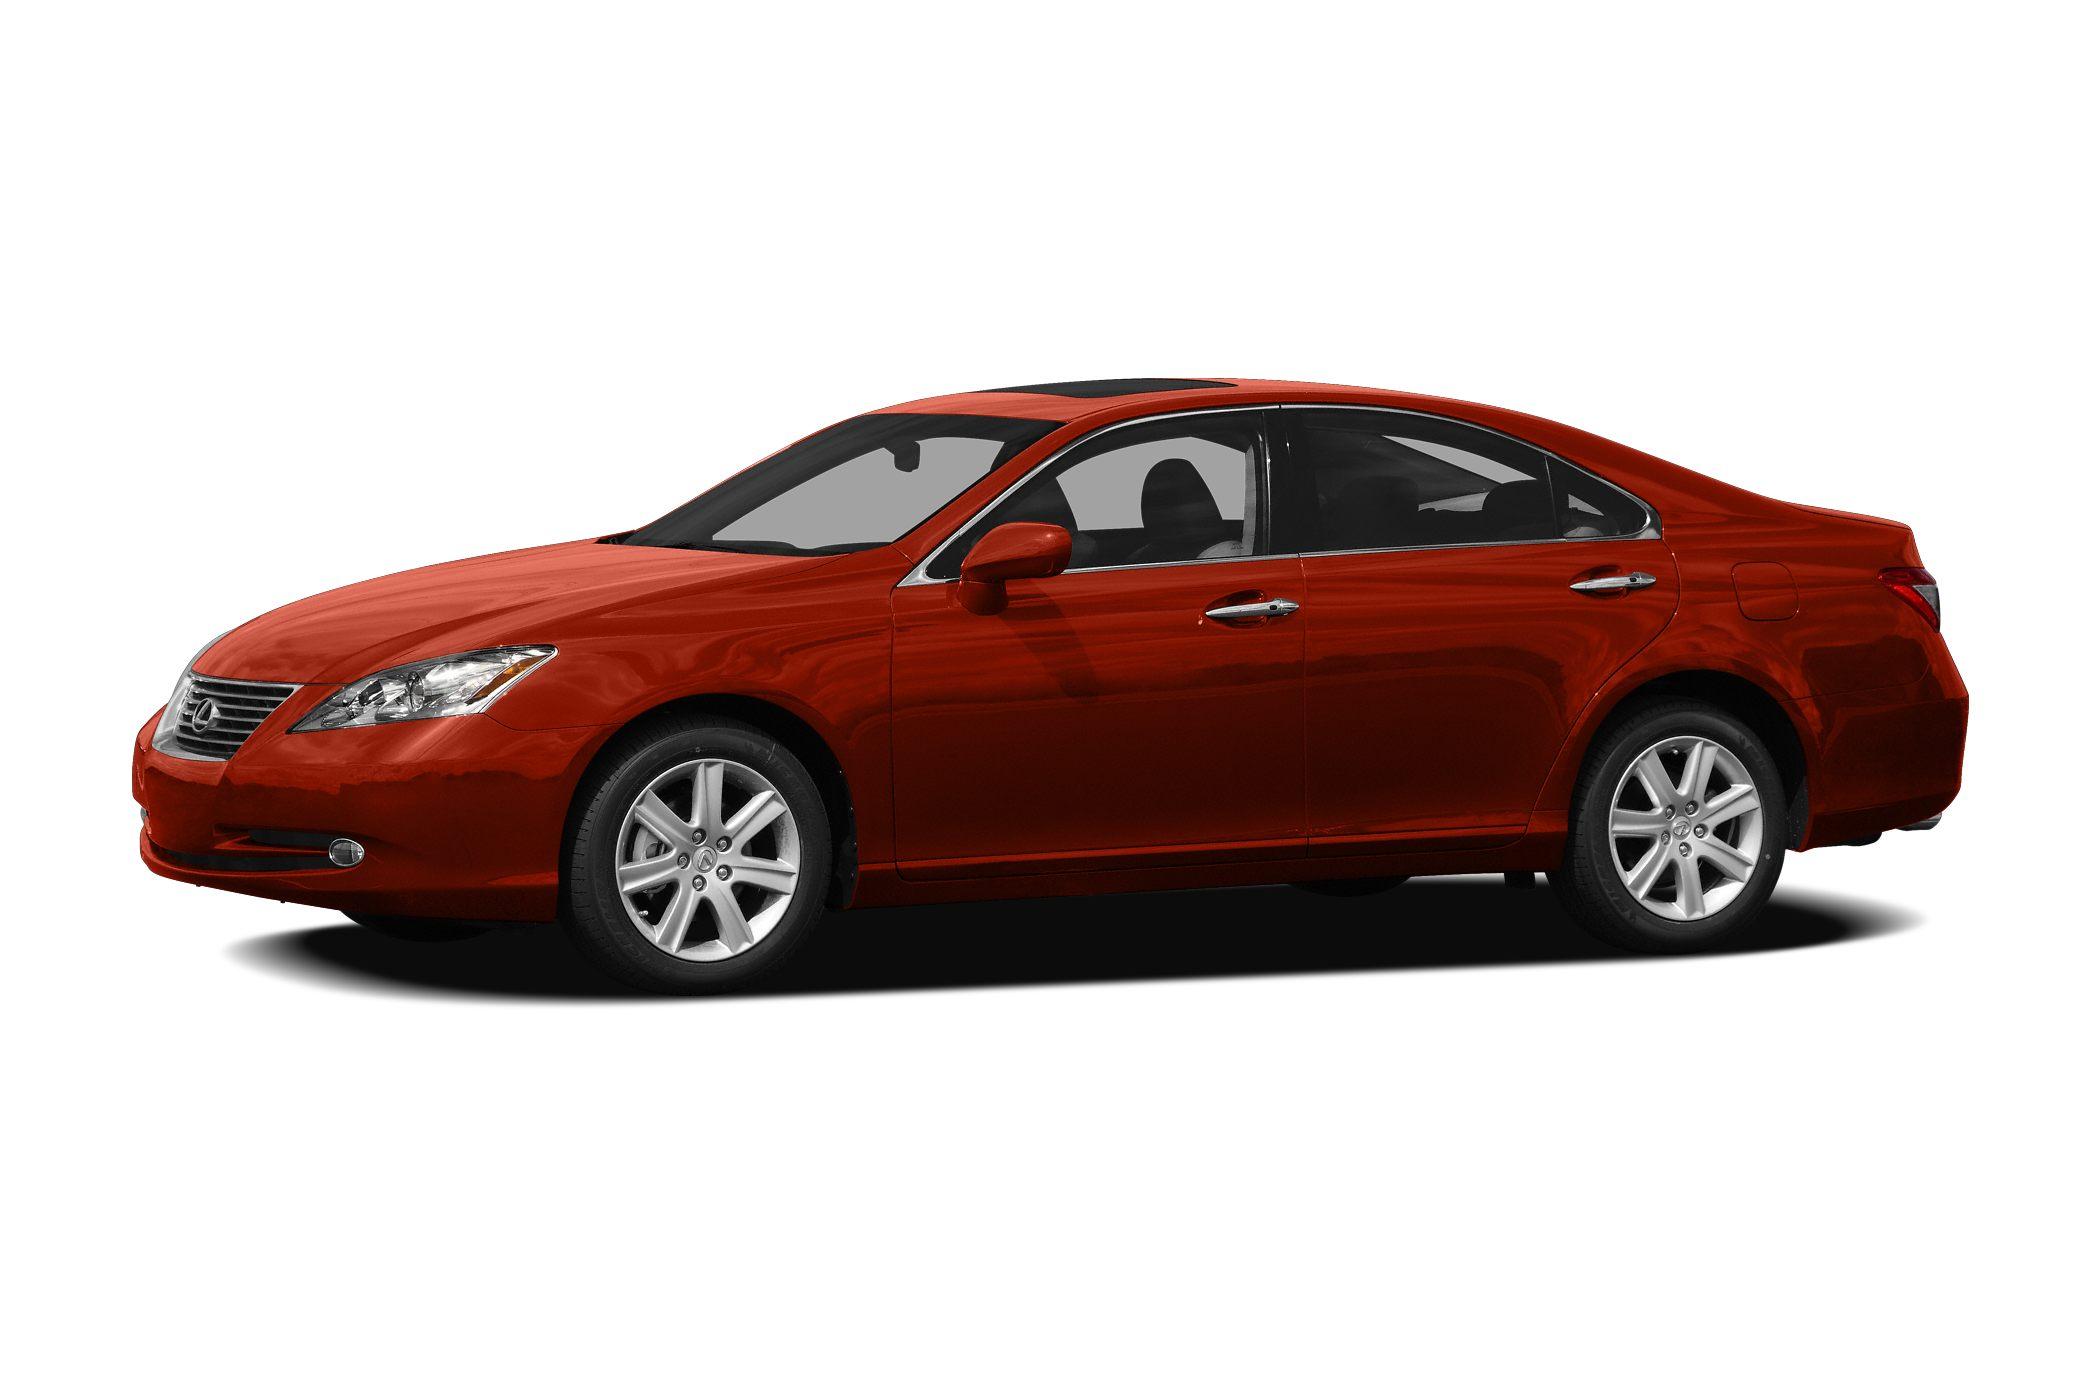 2008 Lexus ES 350 Base Miles 79523Color Gray Stock 228858 VIN JTHBJ46G682228858